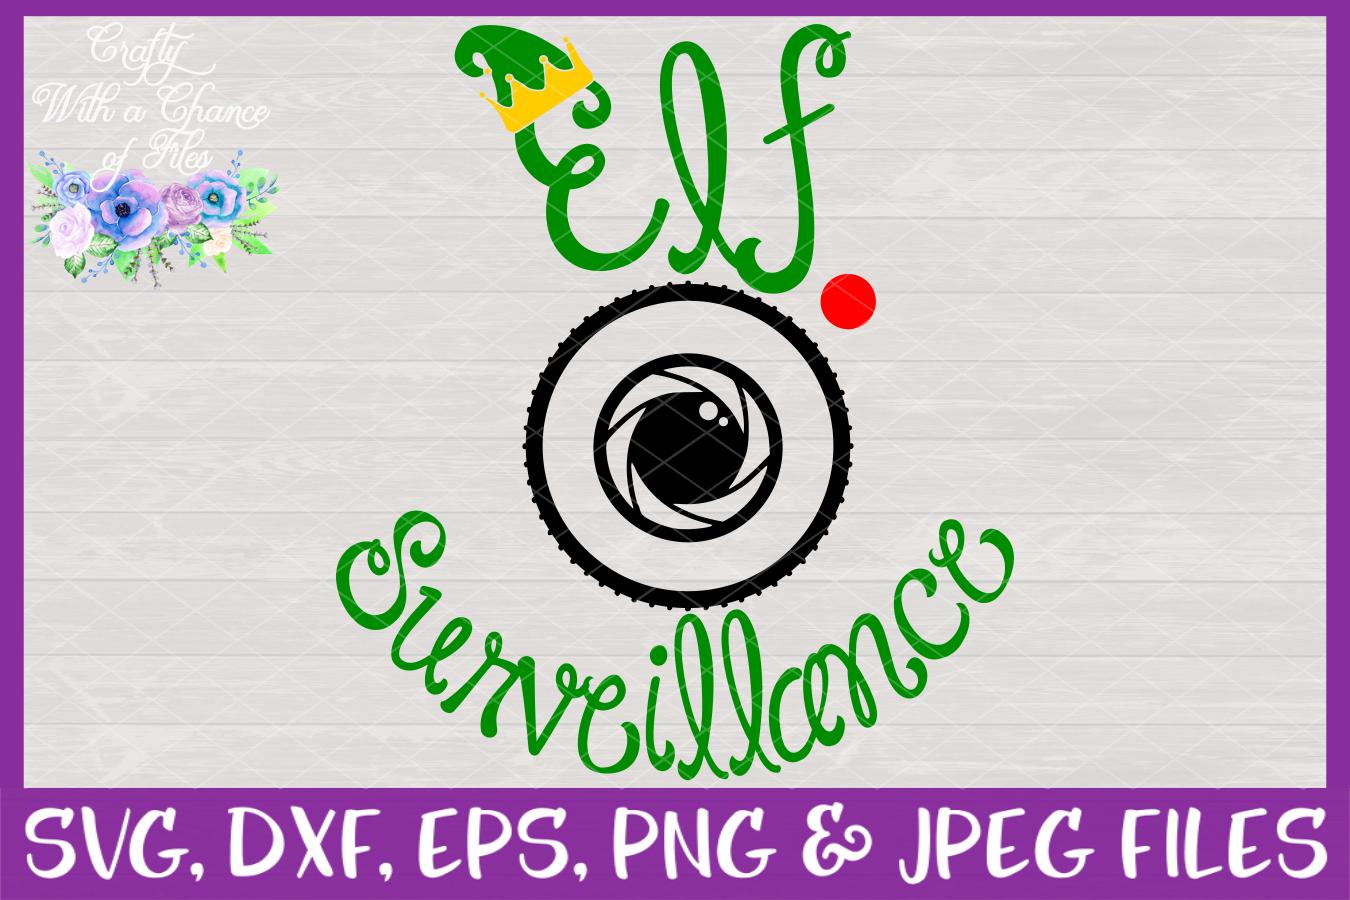 Elf Surveillance SVG - Christmas Ornament Design example image 3